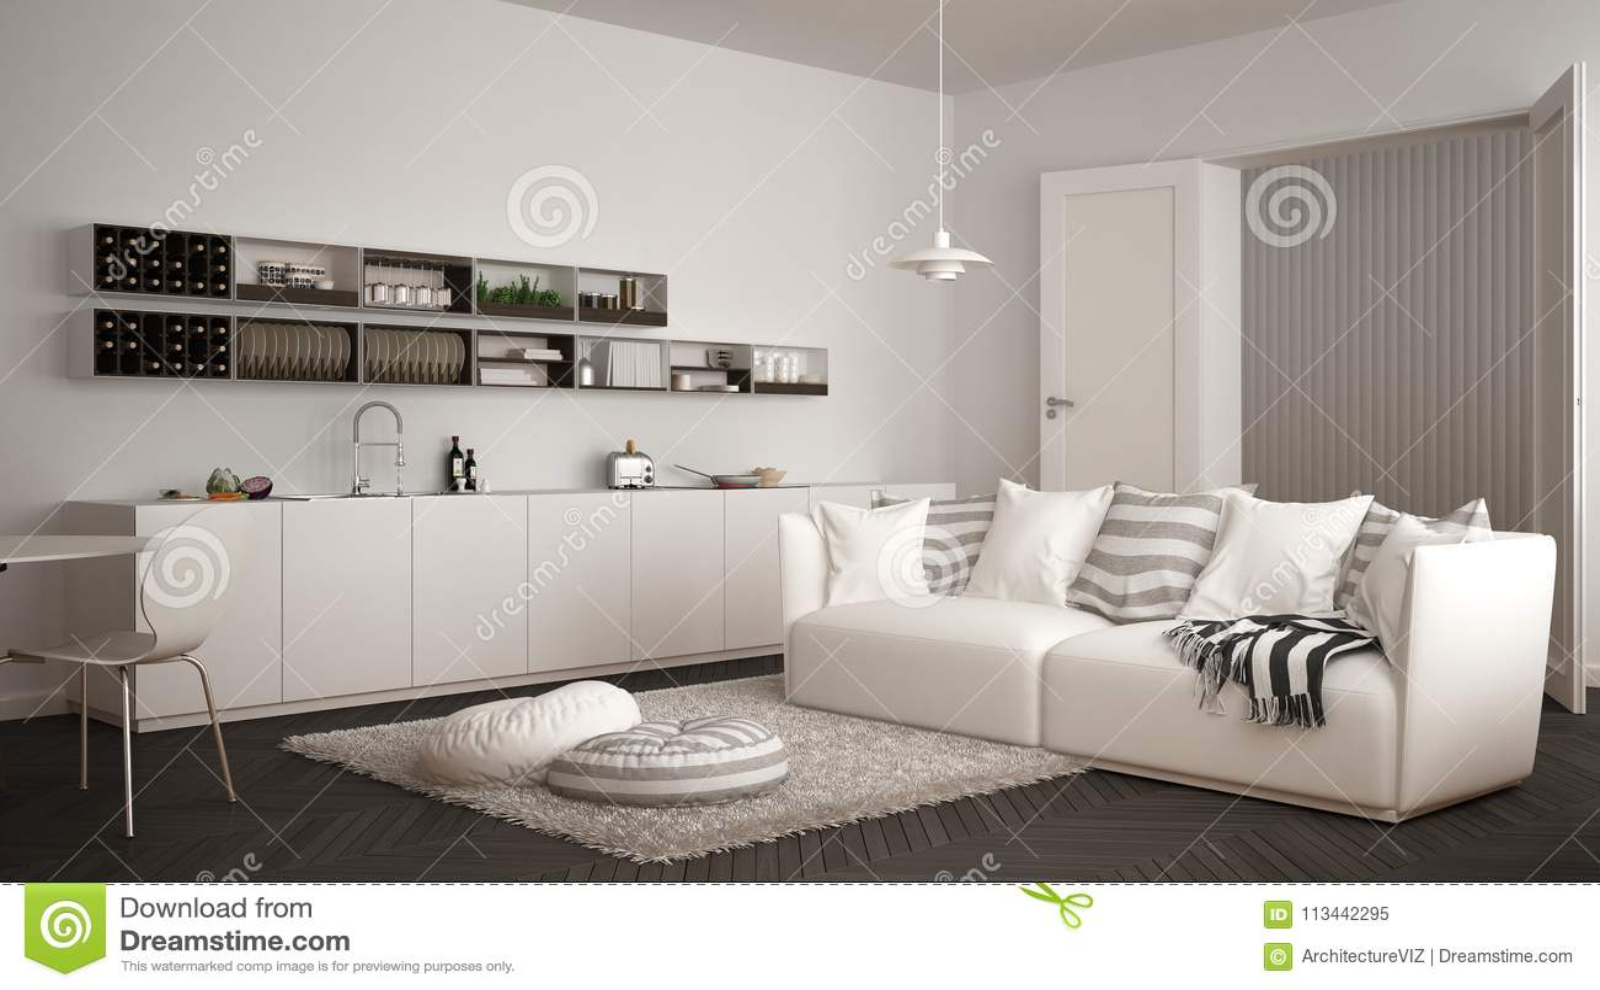 grey kitchen rugs island prices 有厨房的斯堪的纳维亚现代客厅 餐桌 沙发和地毯与枕头 最低纲领派白色 最低纲领派白色和灰色建筑学室内设计